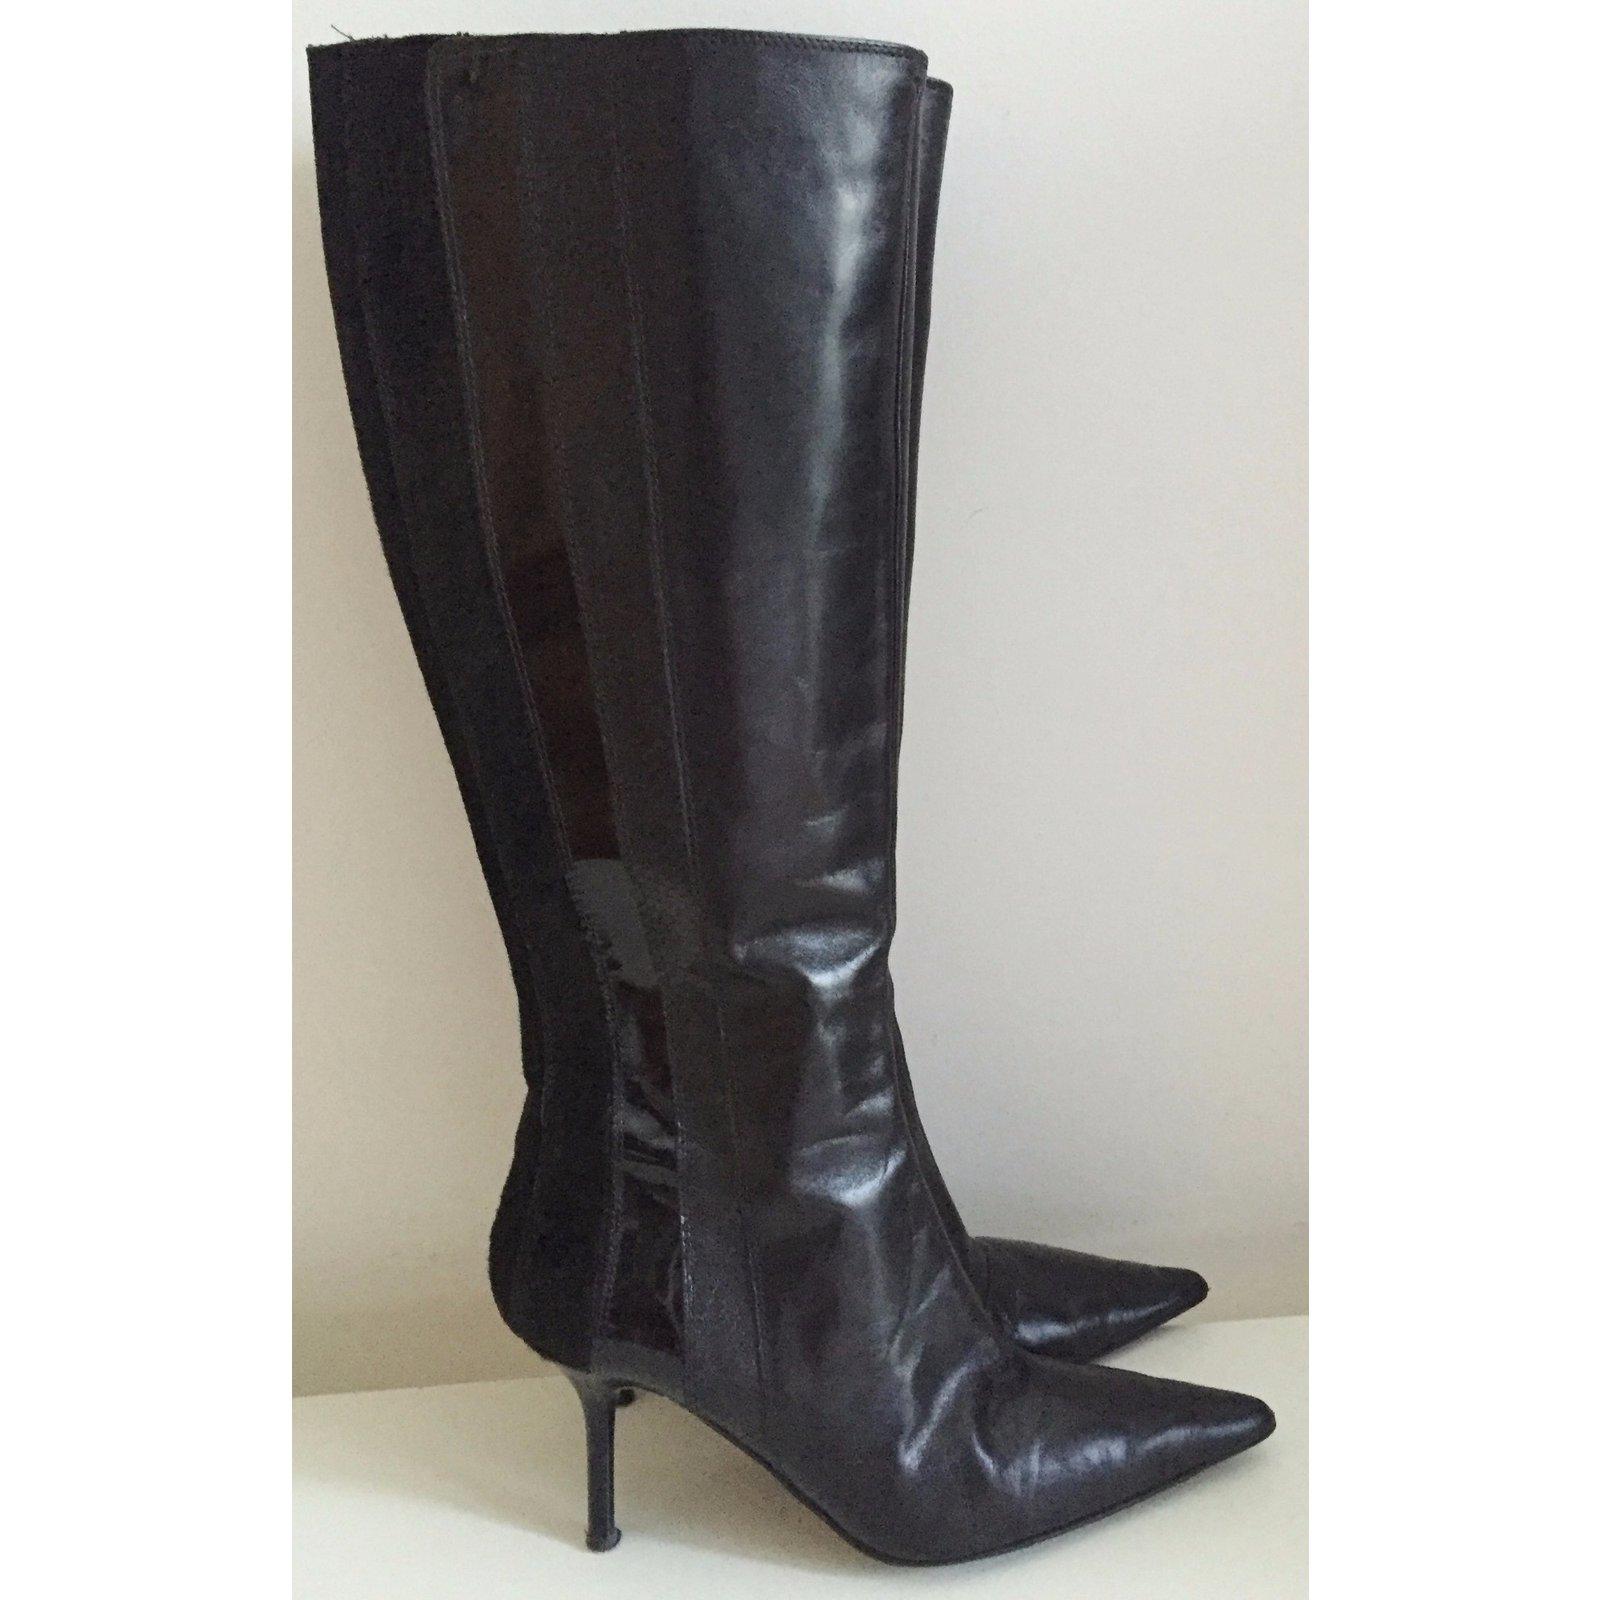 831905cb1d8 Facebook · Pin This. Karen Millen Boots Boots Leather Black ...